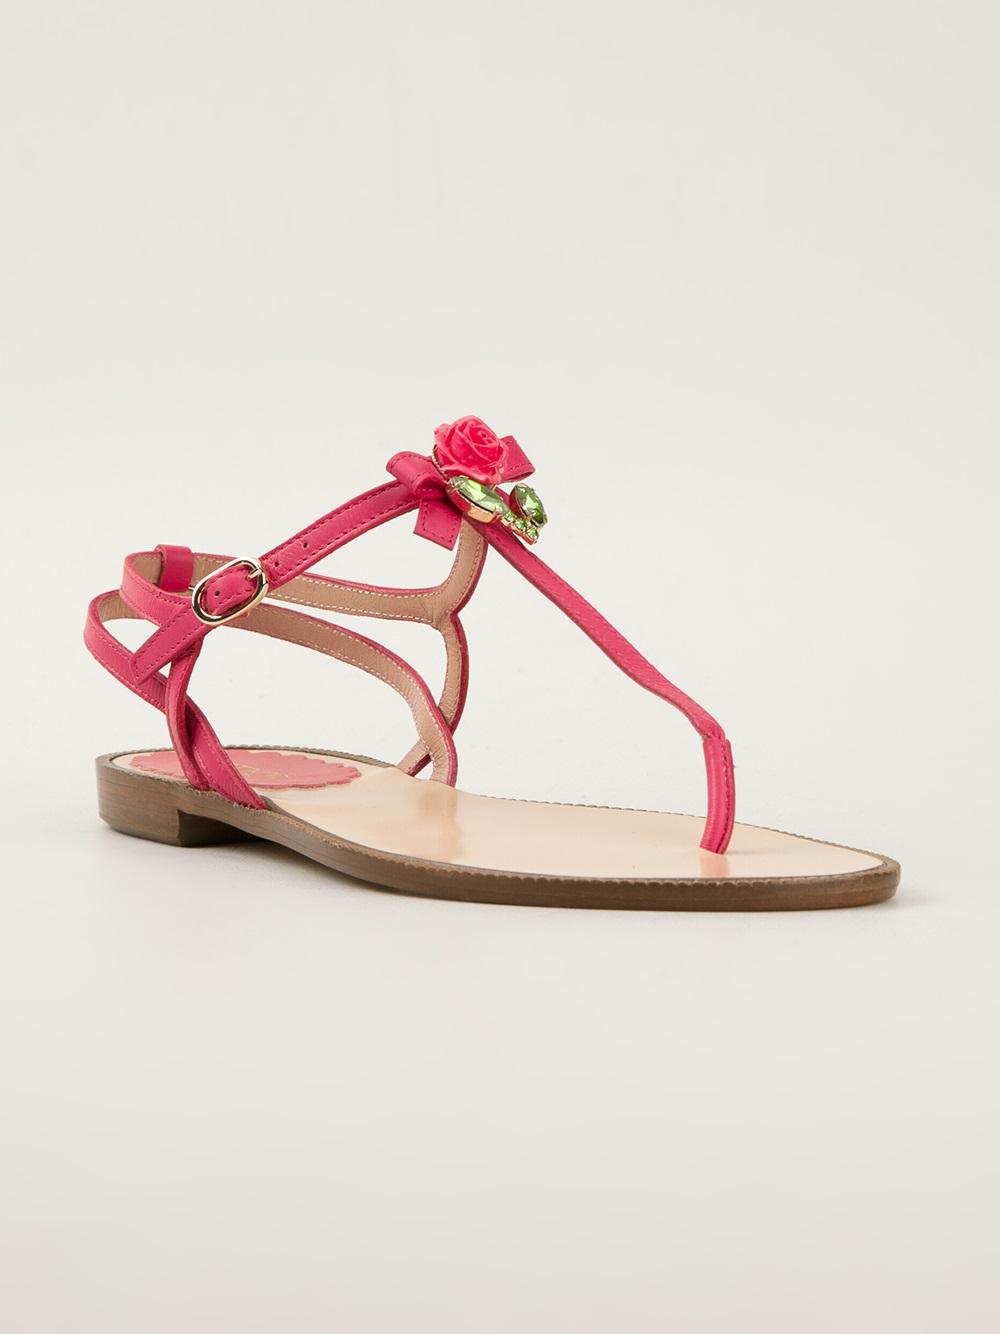 valentino embellished sandals in pink pink